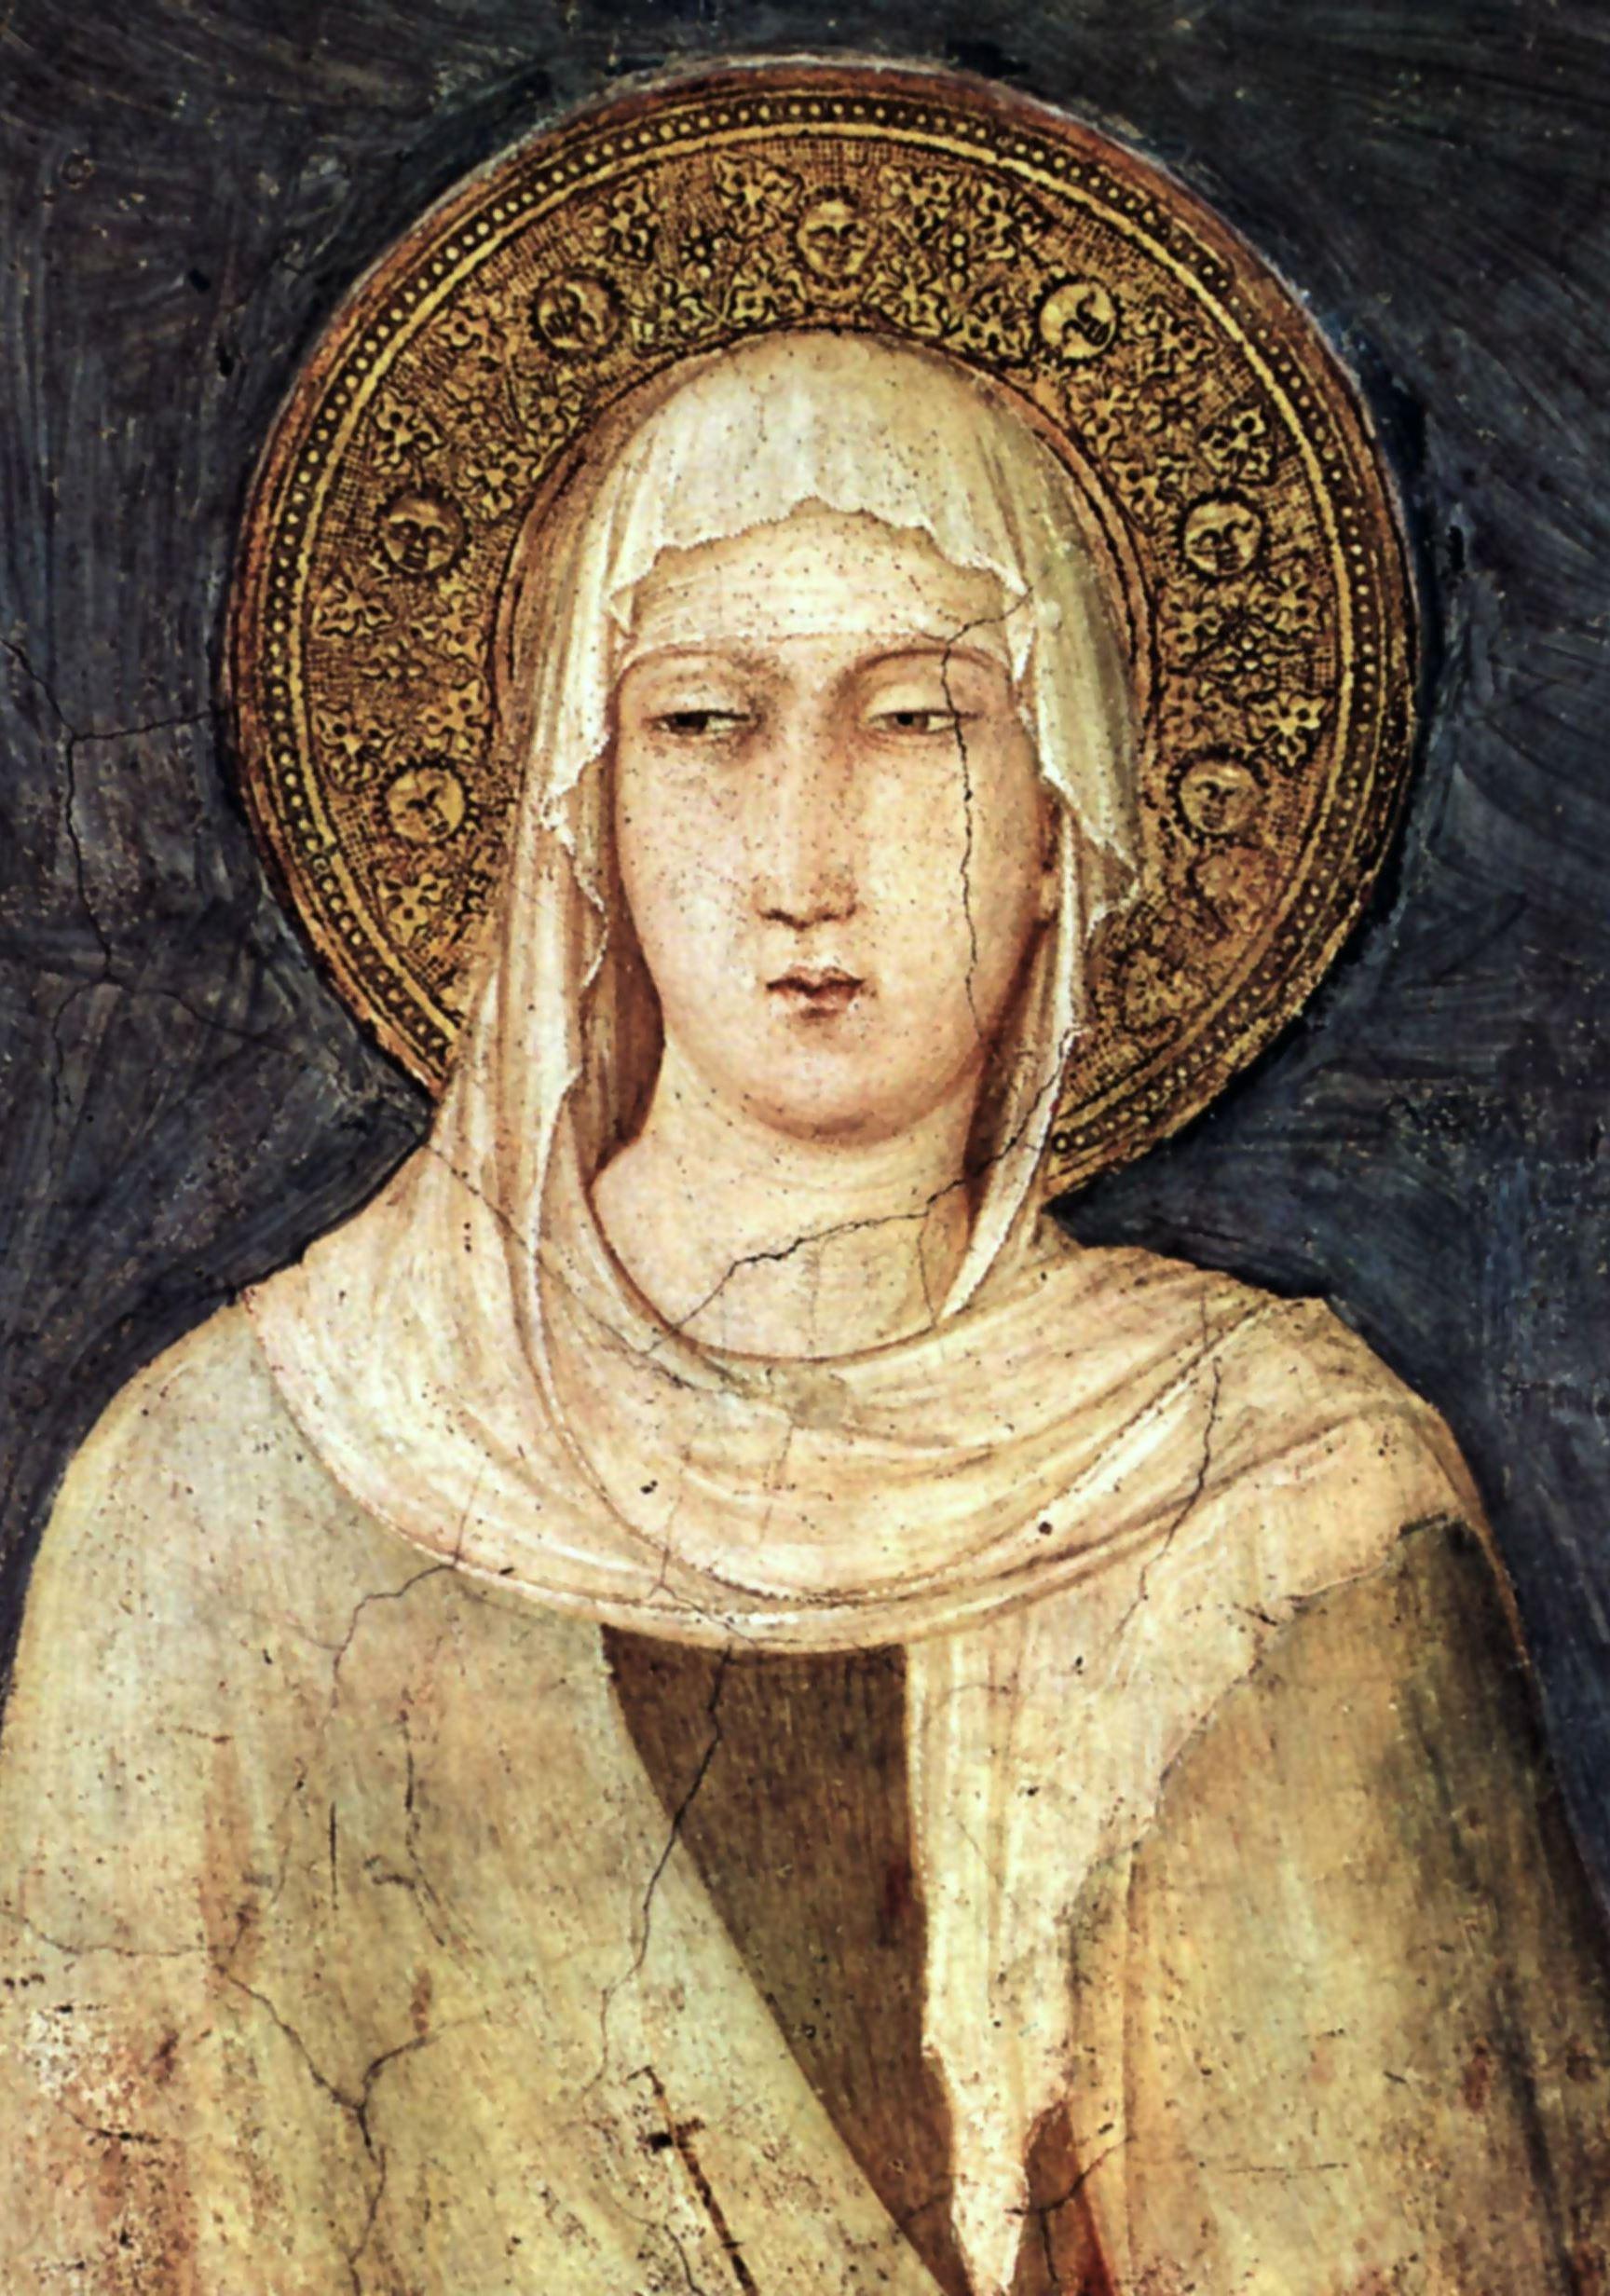 Simone Martini, Die heilige Klara, Freskendetail in der Unterkirche der Basilika San Francesco in Assisi, 1322–1326